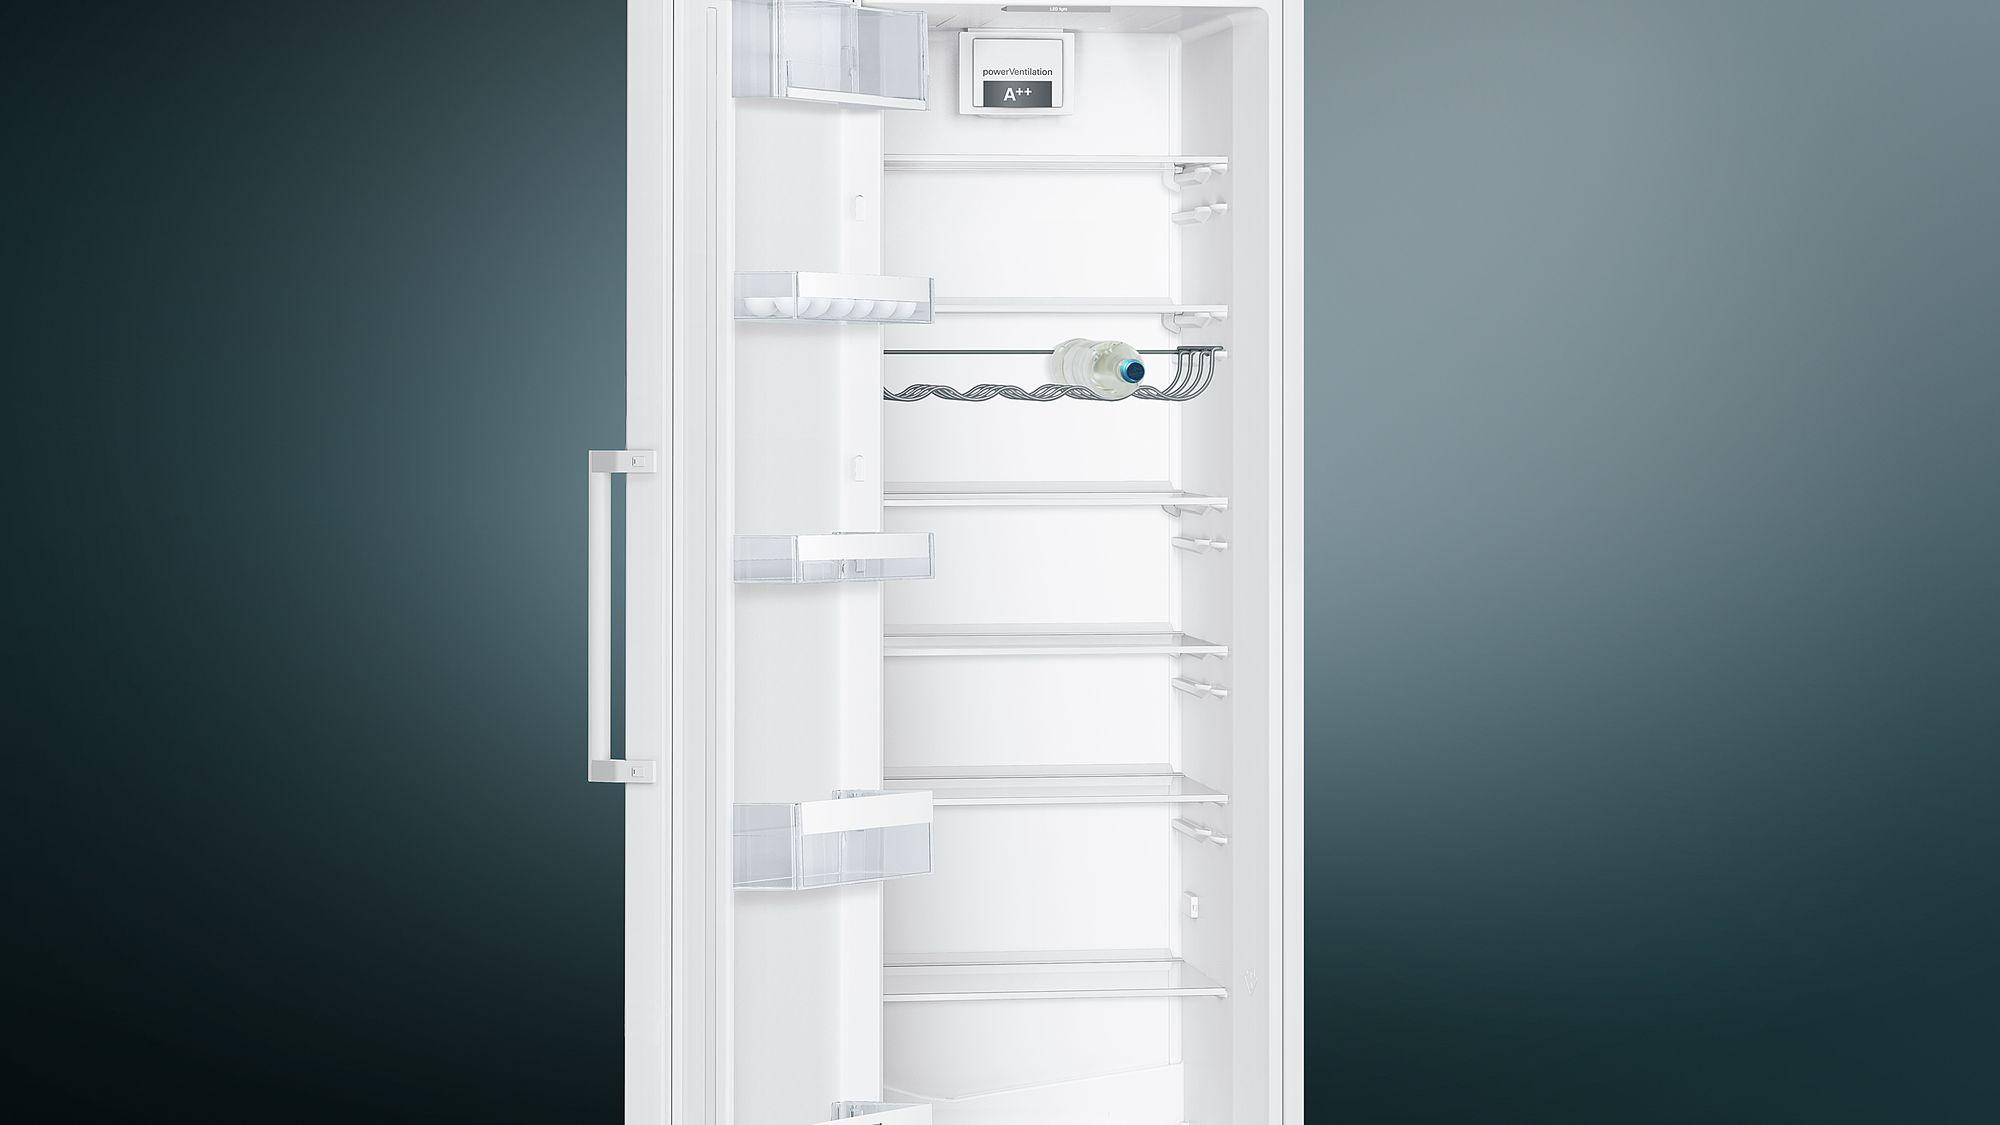 Siemens Kühlschrank Laut : Siemens stand kühlschrank iq300 weiß ks36vvw3p psi24.com